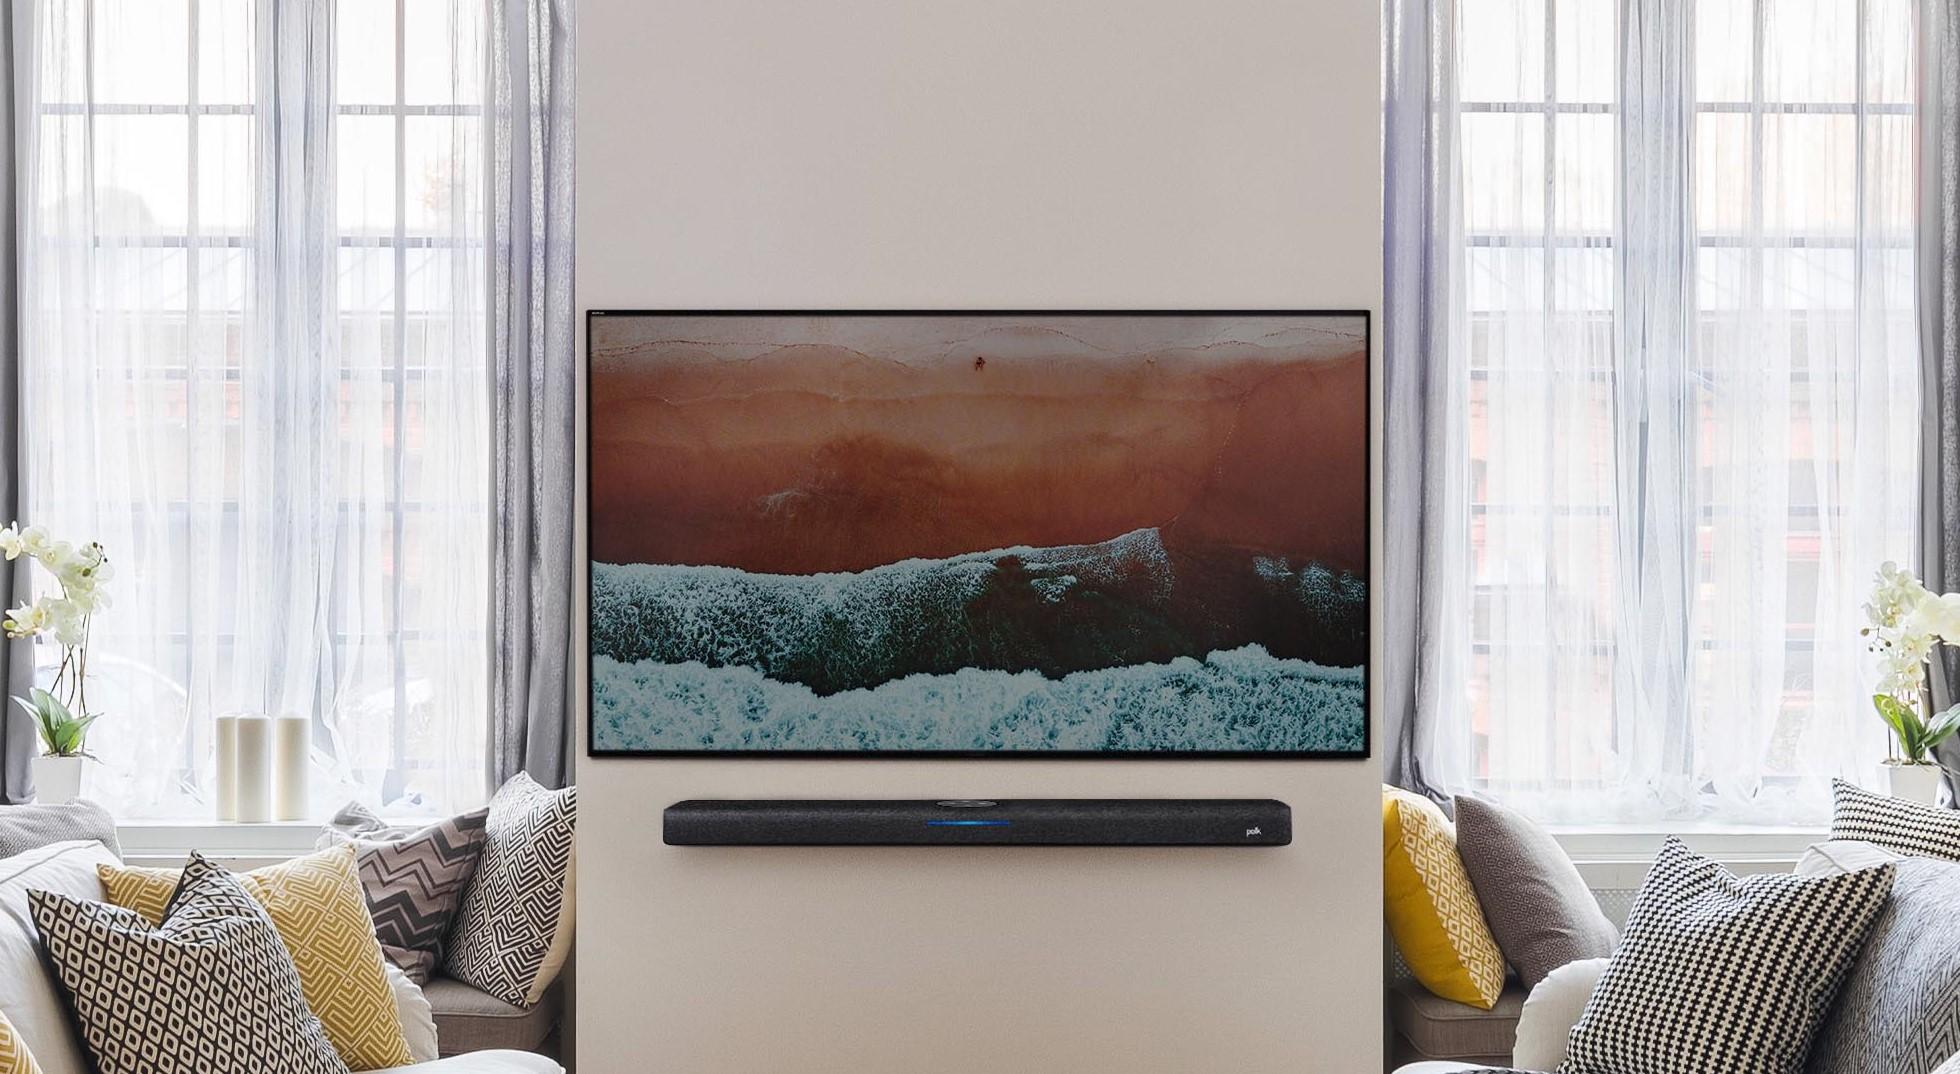 Polk React soundbar as depicted in a living room